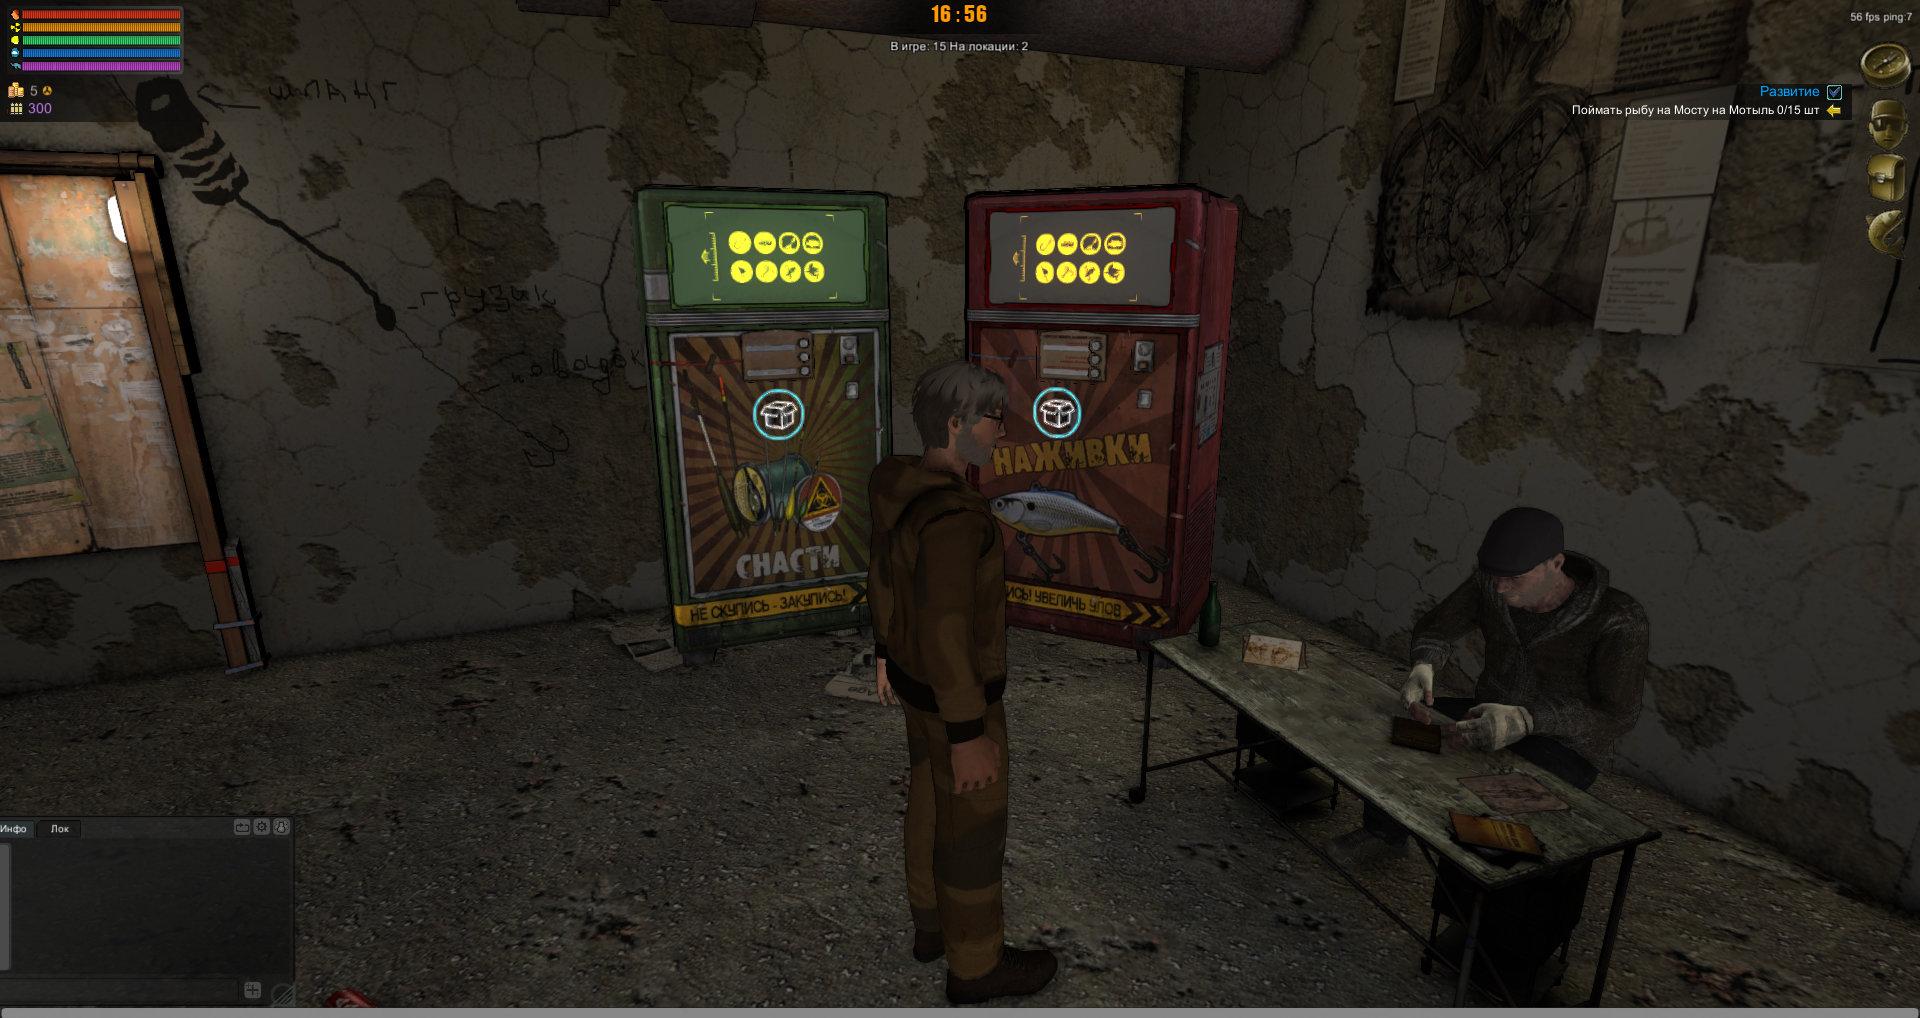 Sergey tabakov avtomat in games